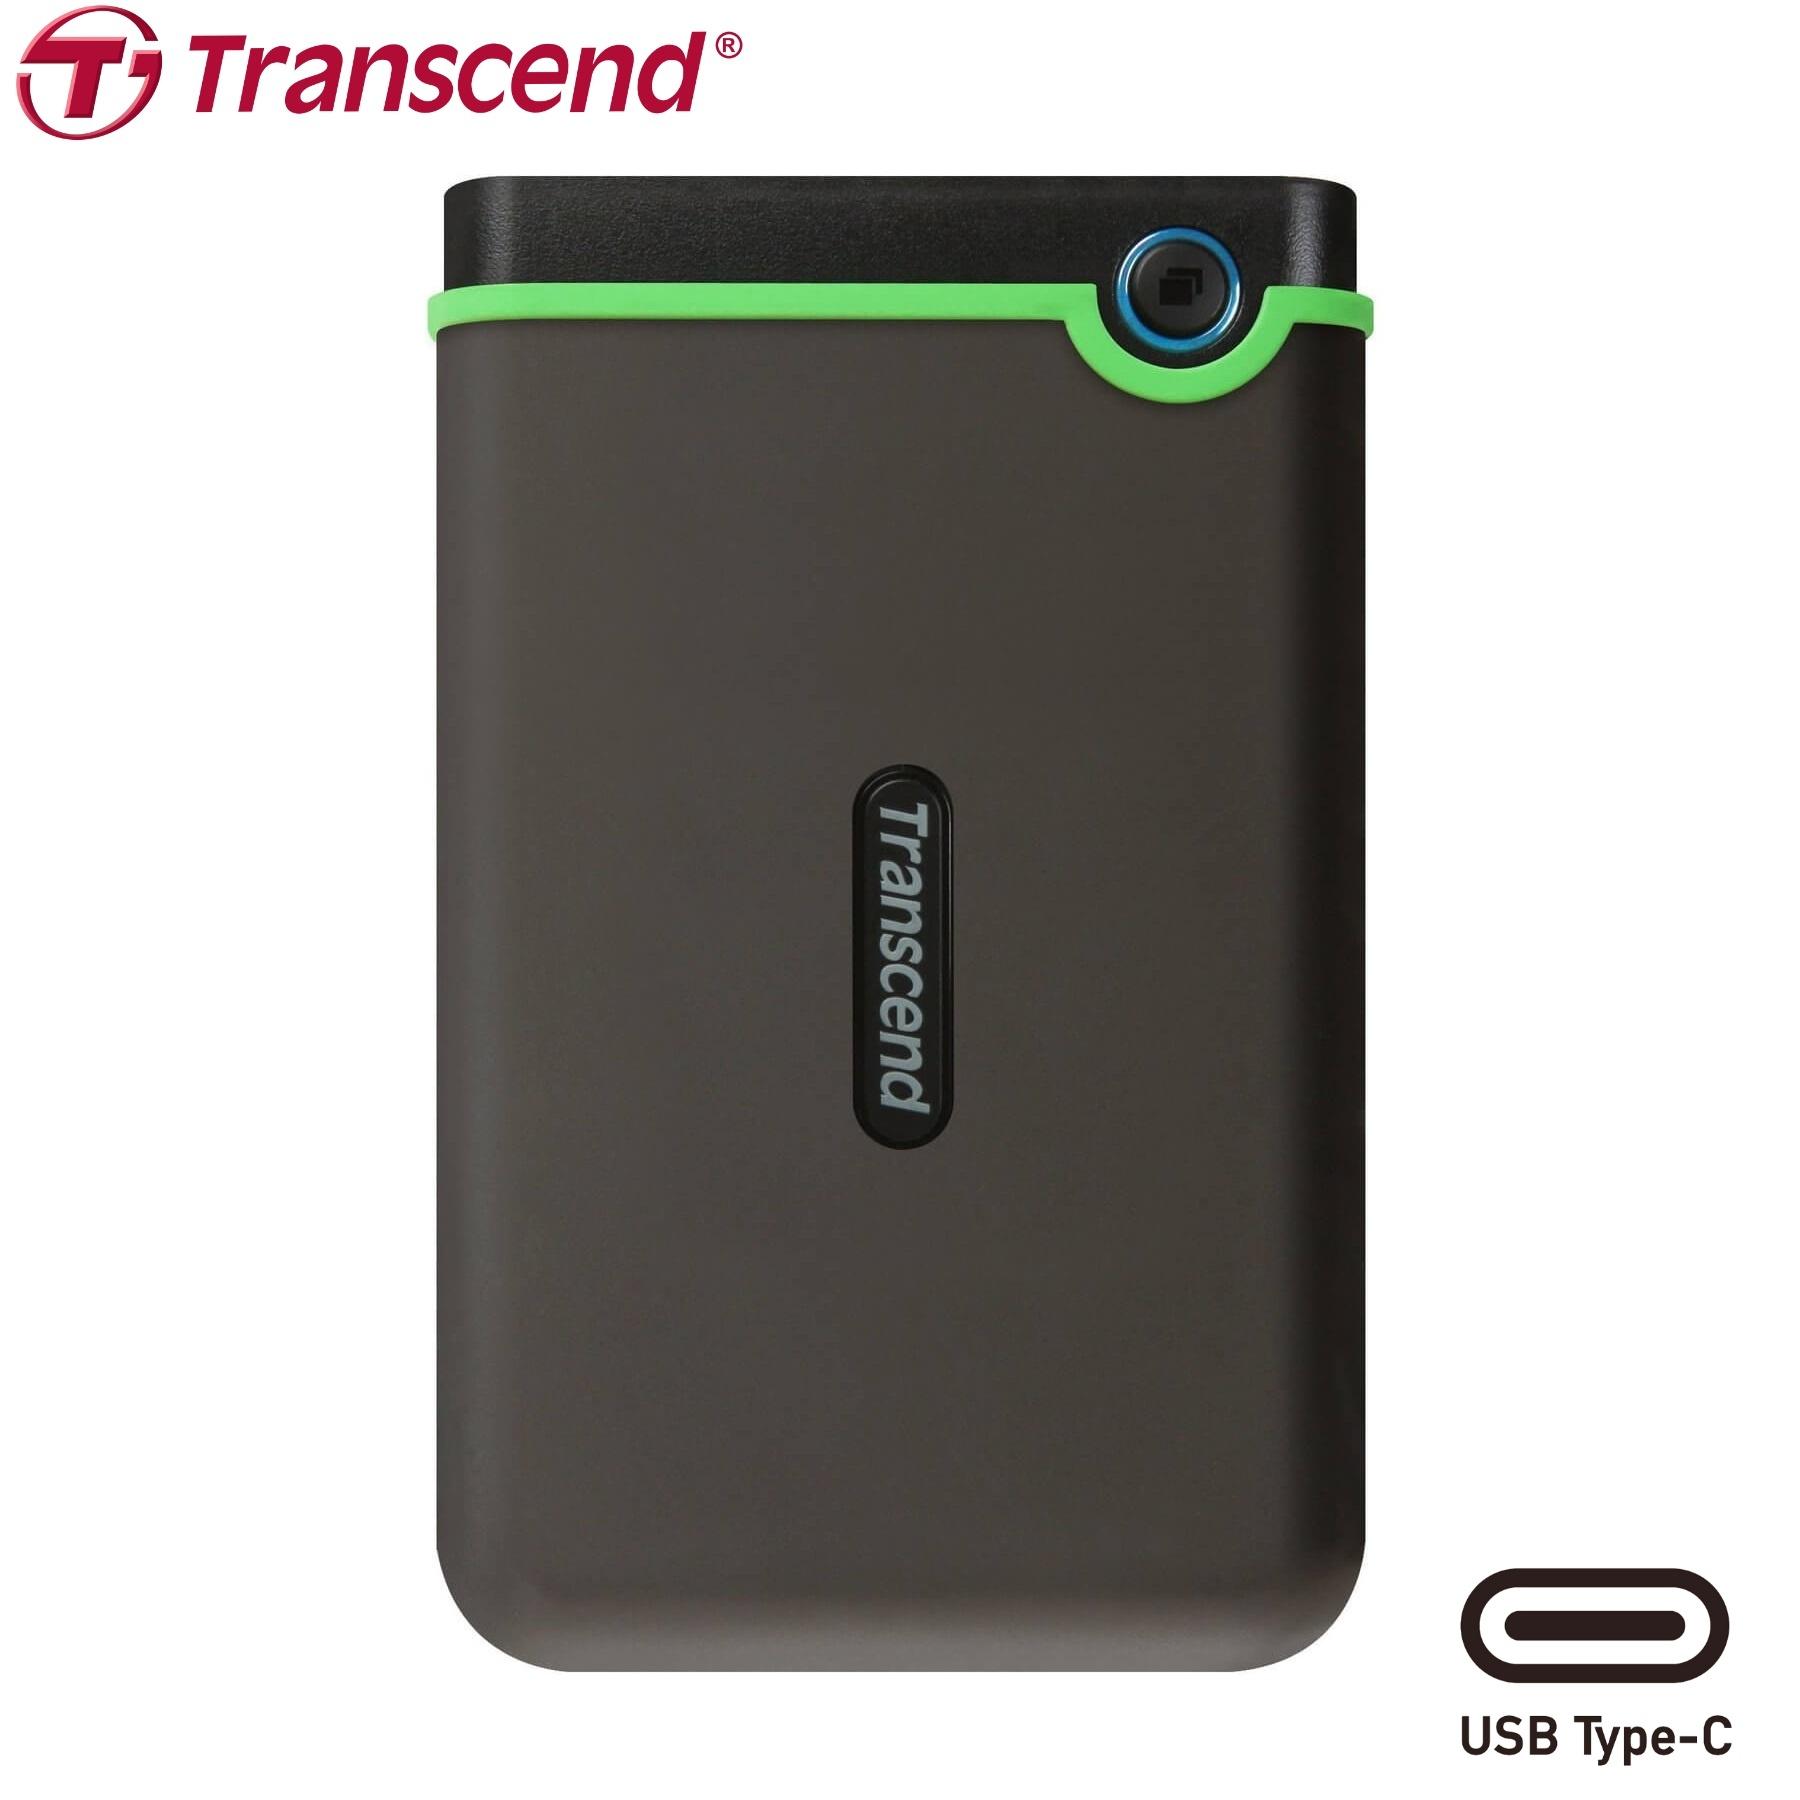 Transcend 2TB StoreJet® 25M3C Type-C USB 3.1 External Hard Drive Military Drop Tested